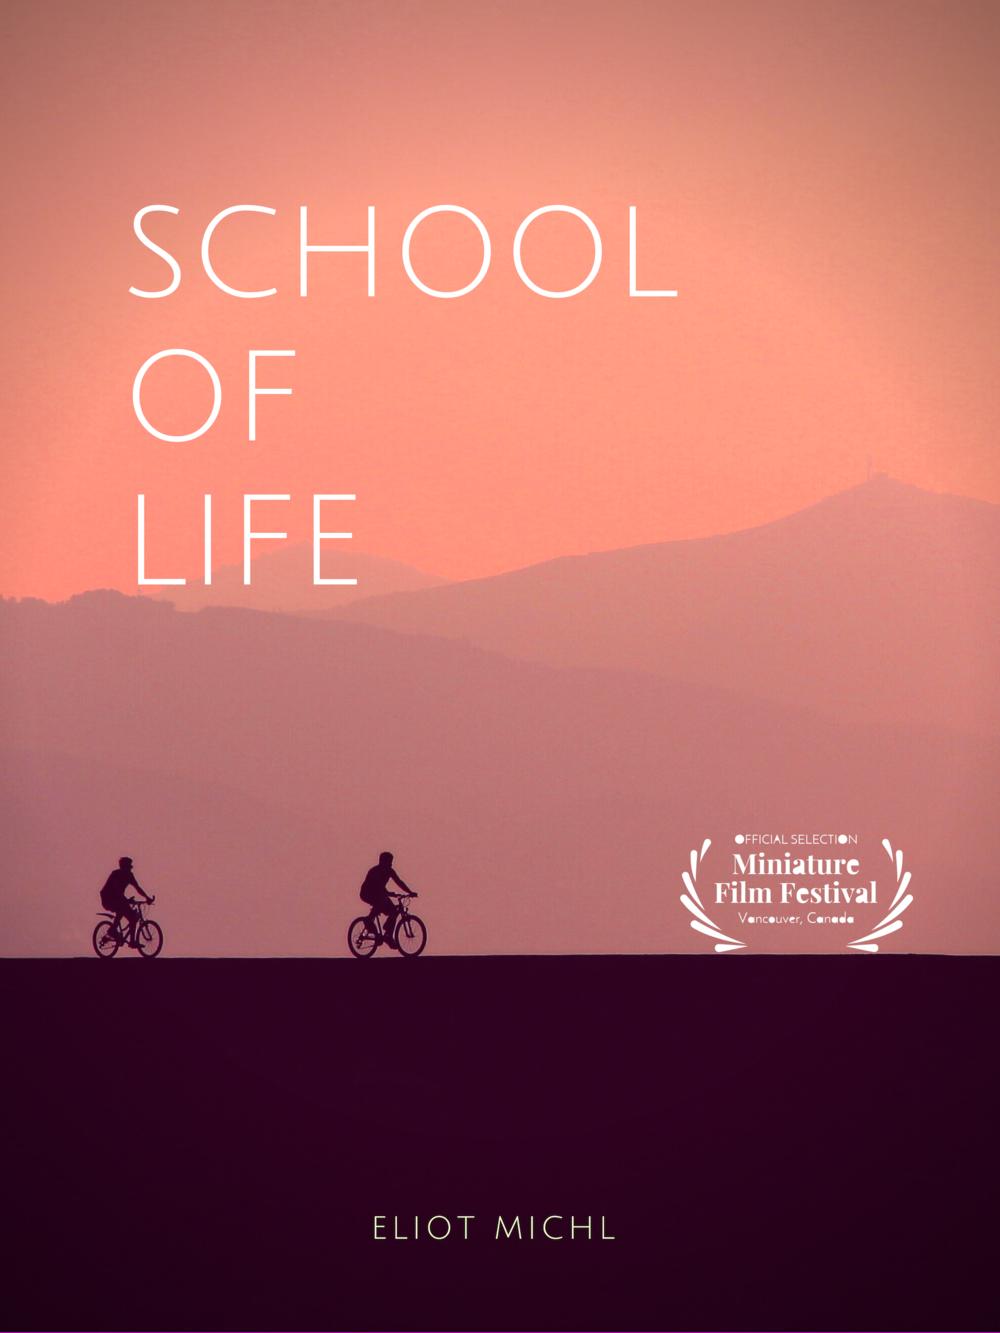 School-of-Life_Eliot Michl.png